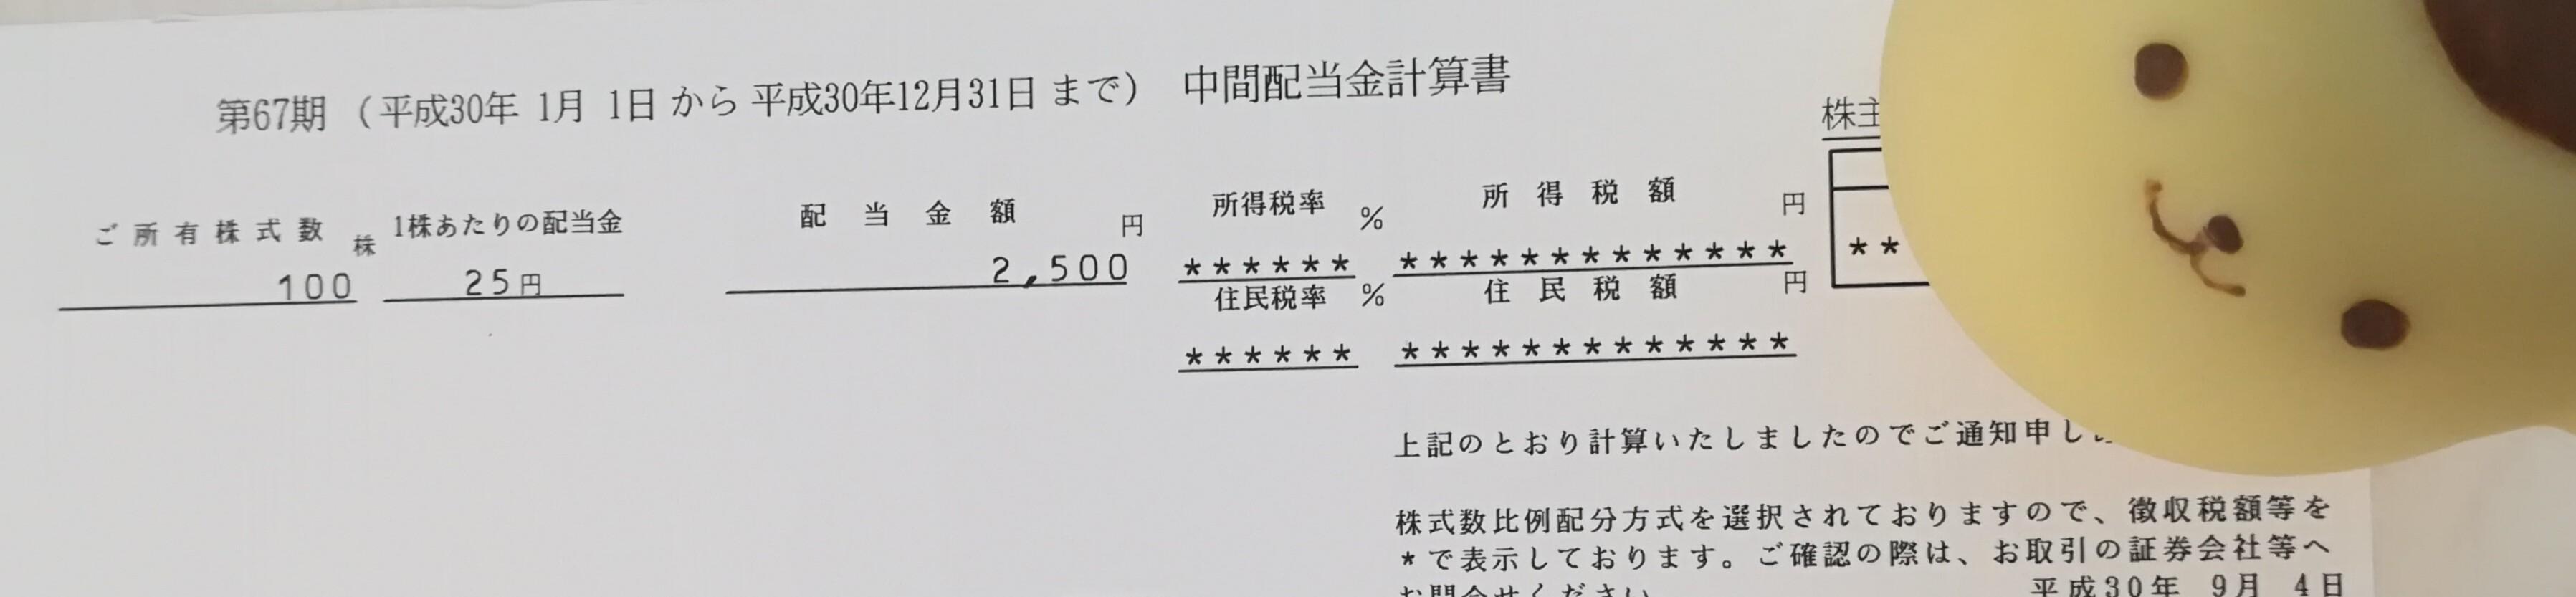 f:id:hiro_116:20180916233422j:image